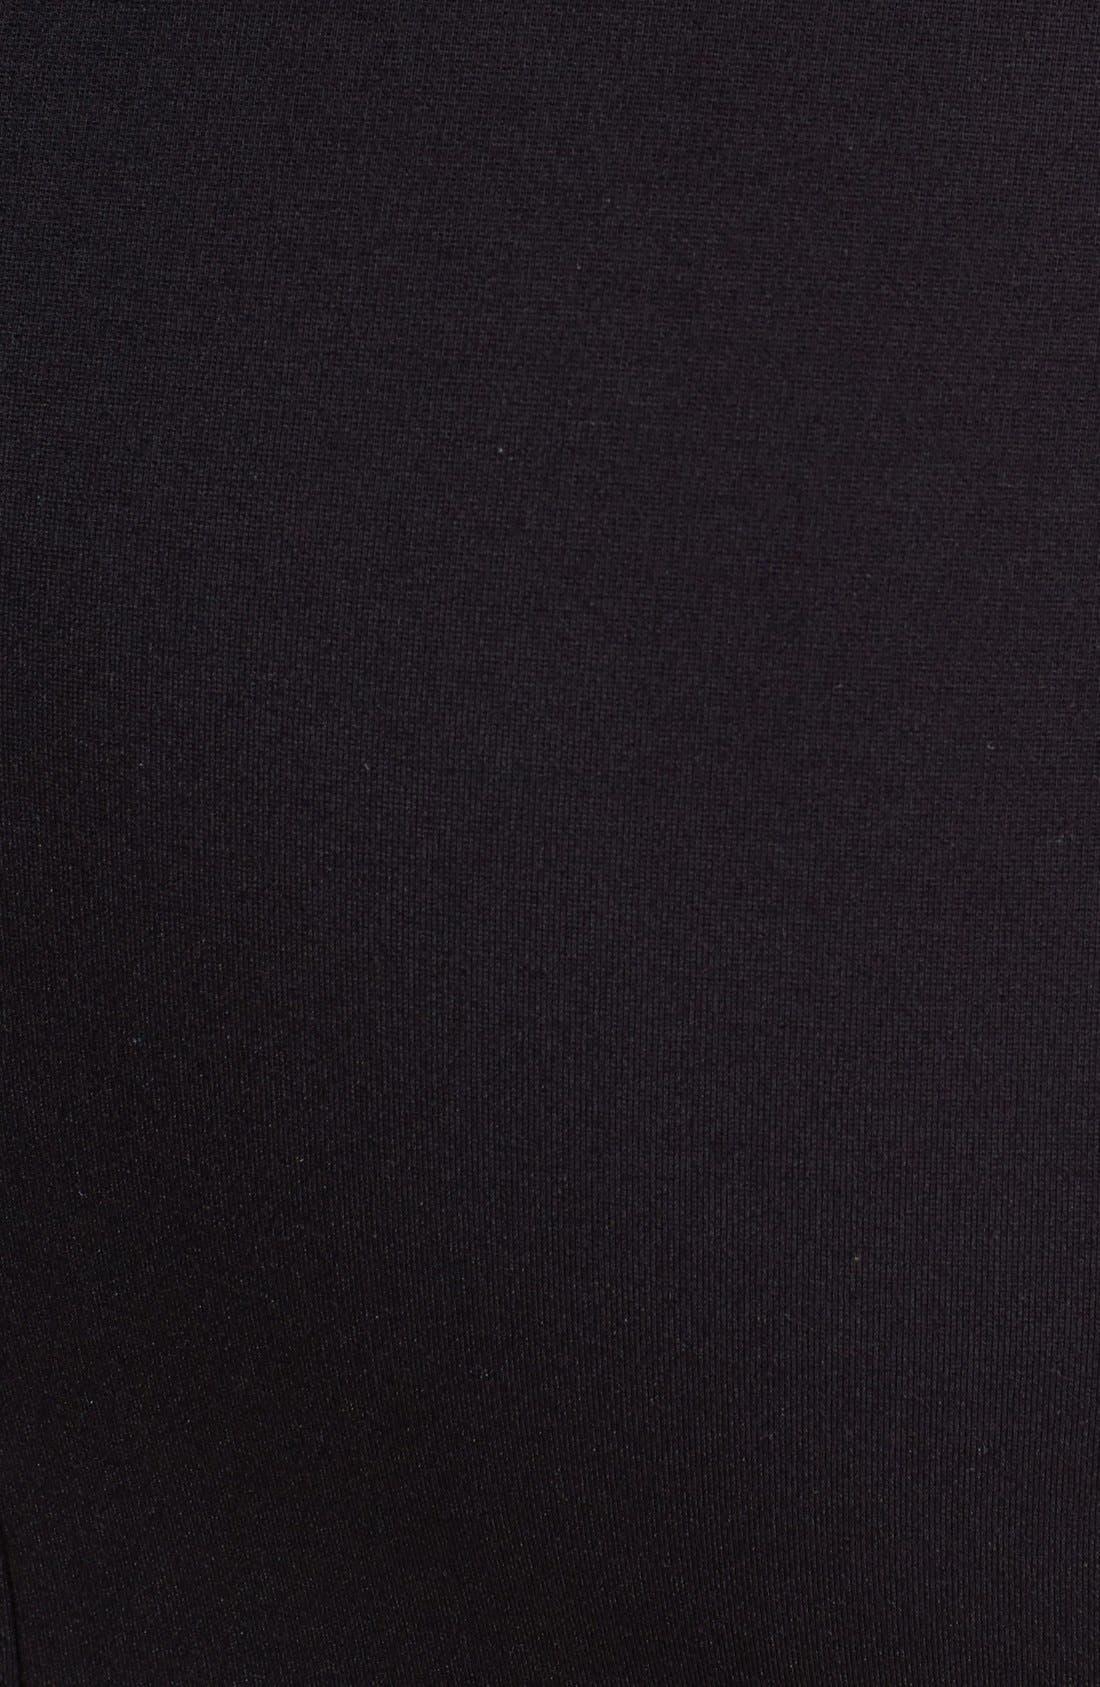 Alternate Image 3  - ABS by Allen Schwartz Lace Block Sheath Dress (Plus Size)